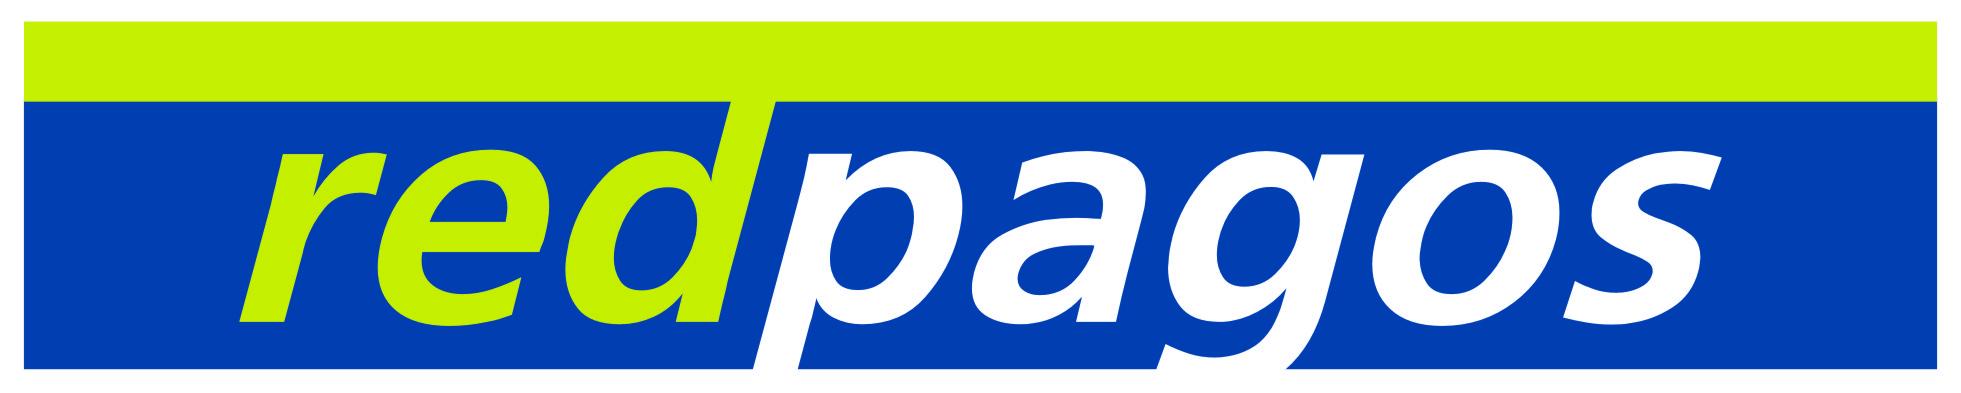 logo Redpagos sin red nacional